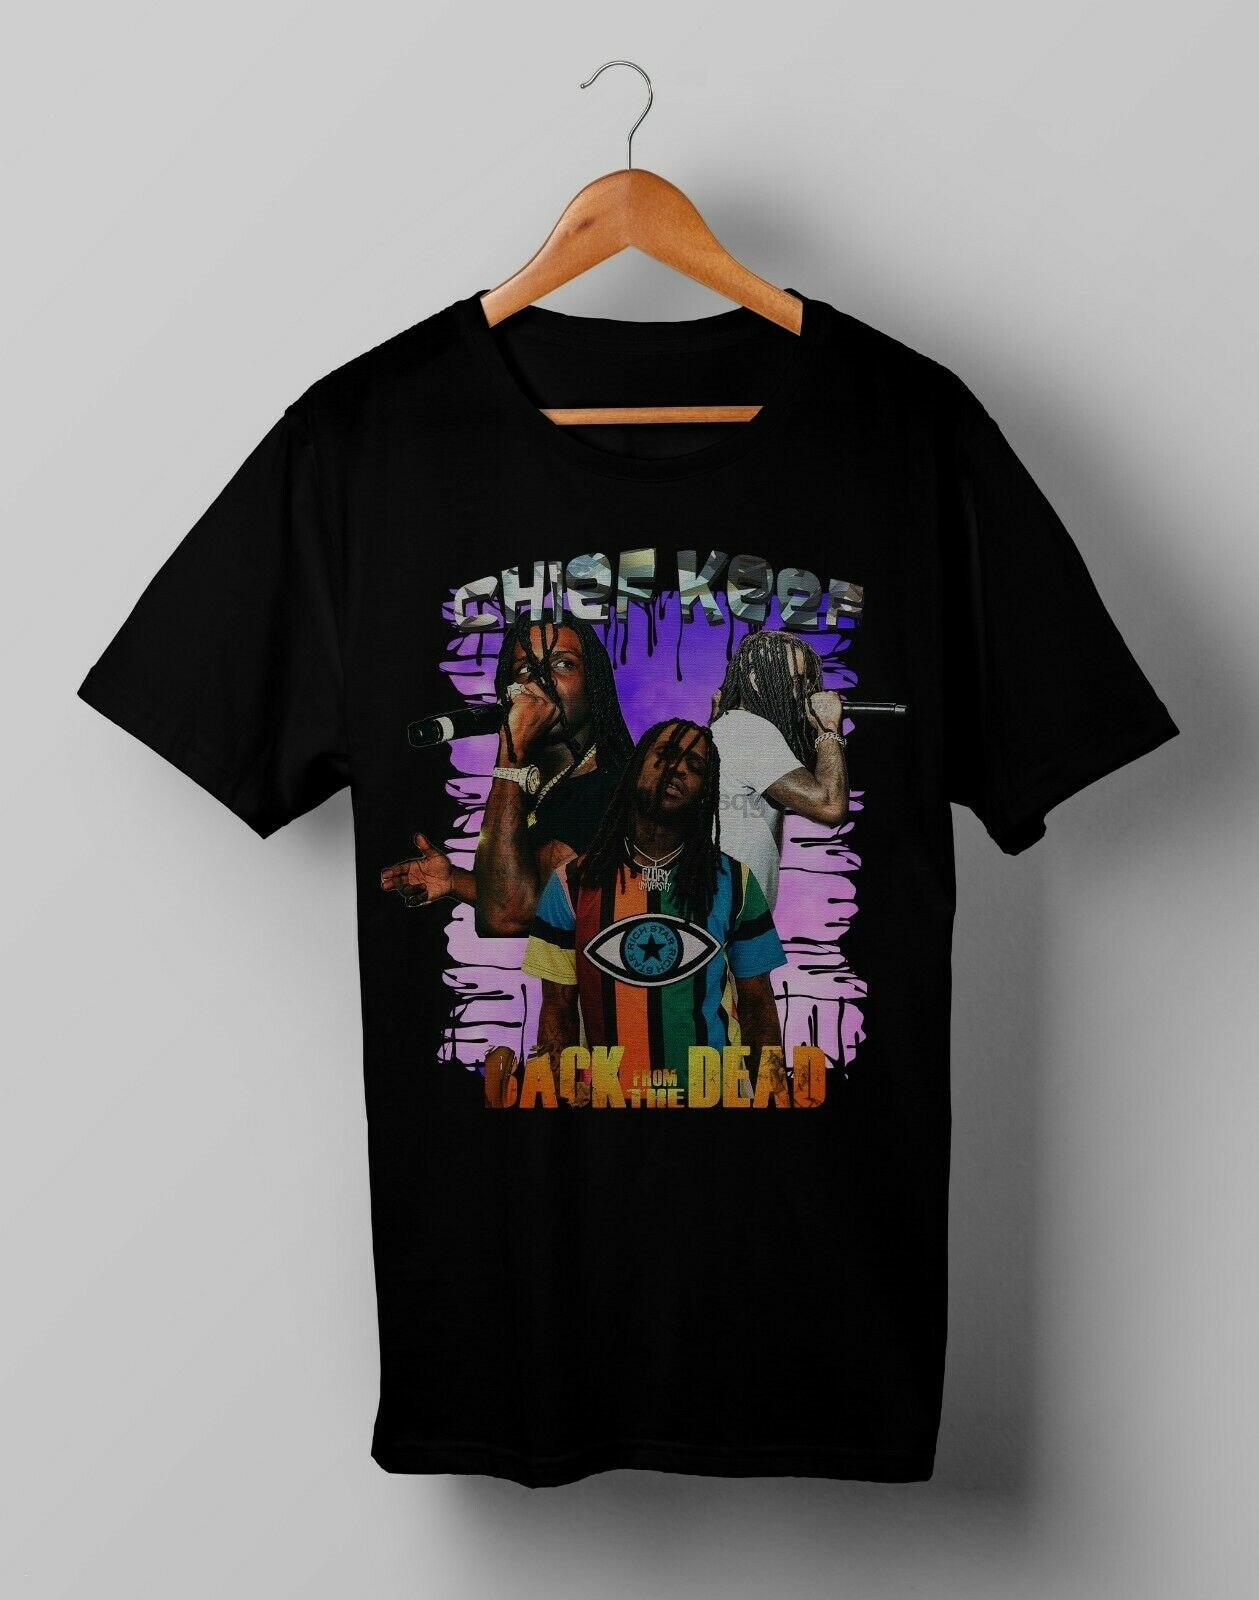 Vintage jefe Keef a muerto camiseta de hip-hop tamaño S, M, L, XL, 2XL